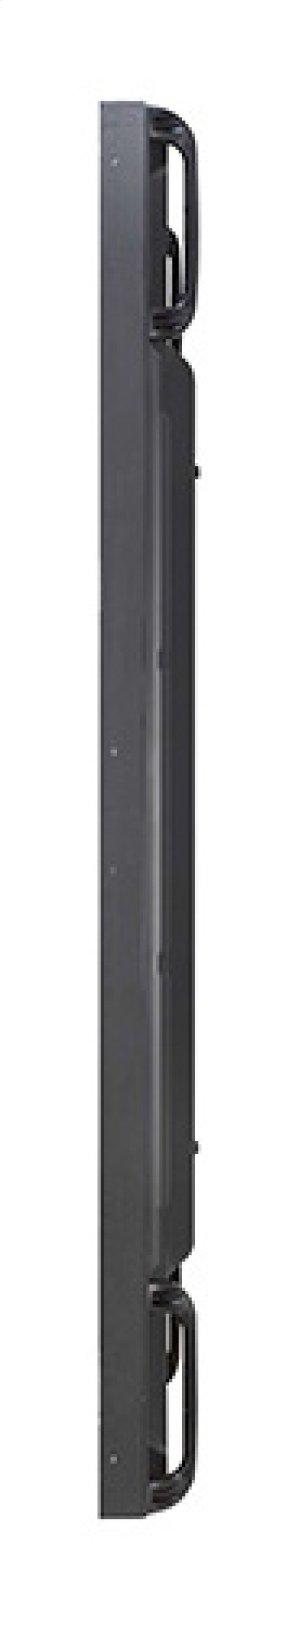 "55"" Class (54.64"" Diagonal) 1.8mm Super Narrow Bezel Video Wall"